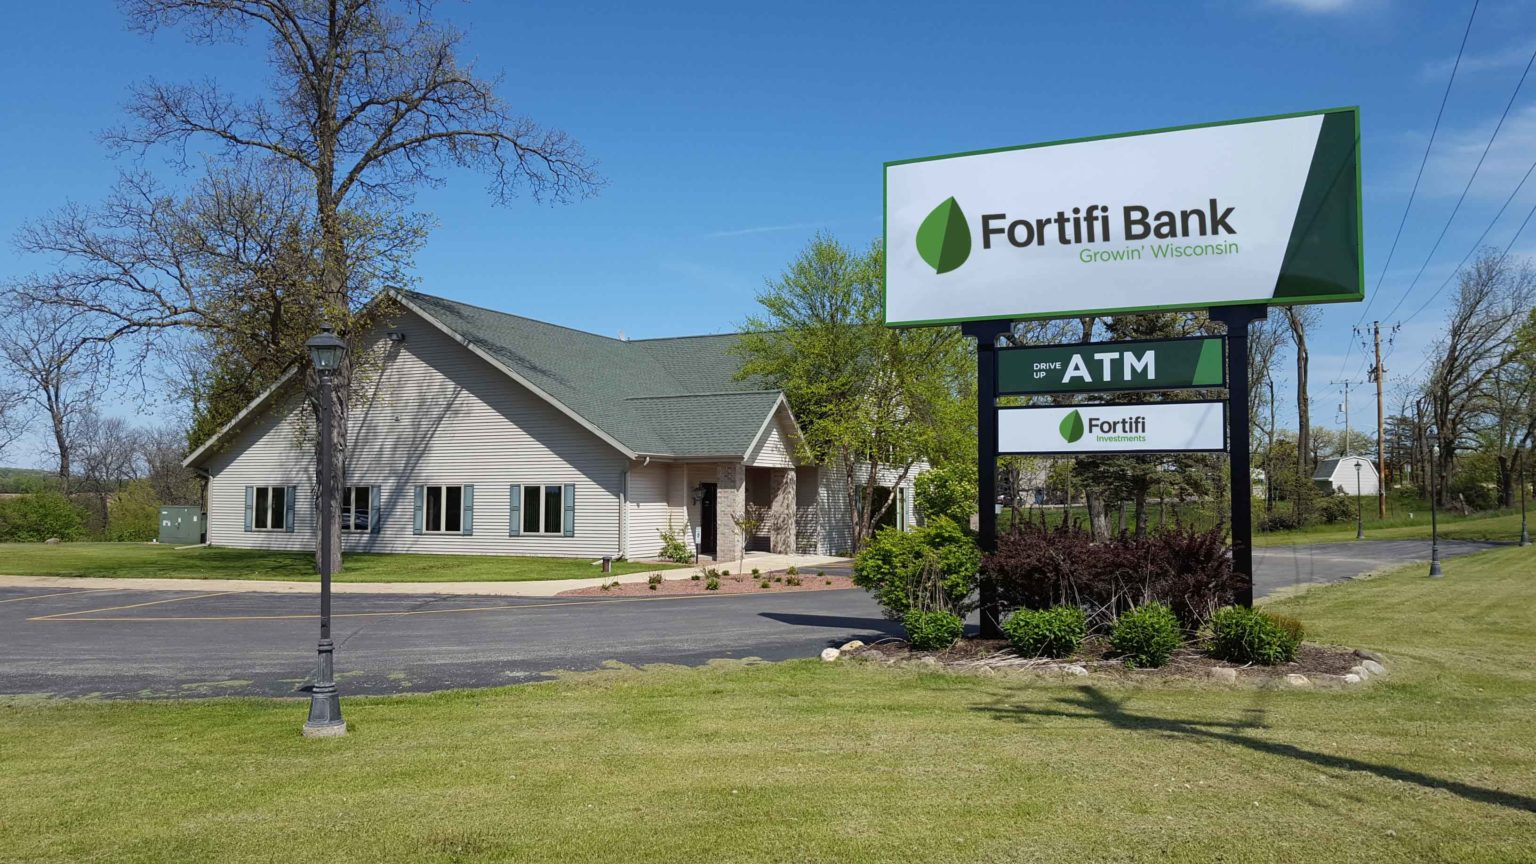 Fortifi Bank - Green Lake, WI 54941 - (855)876-1500 | ShowMeLocal.com